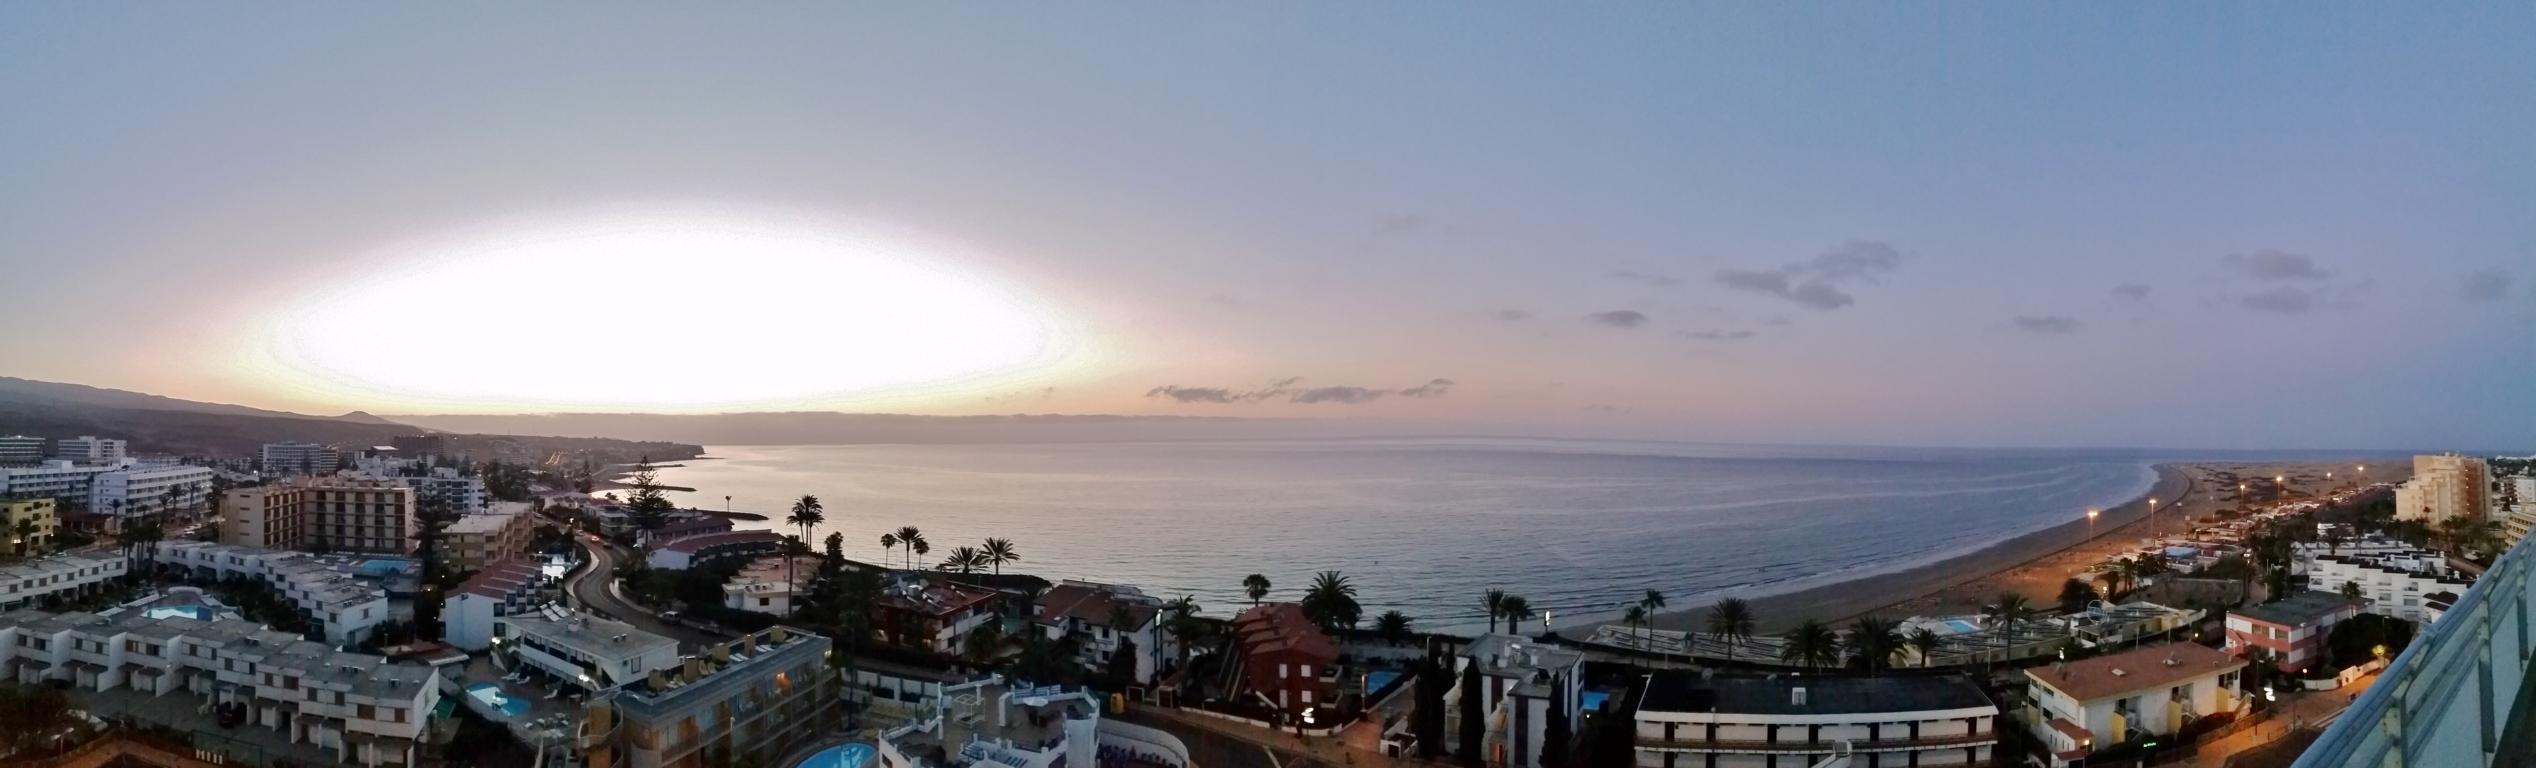 Gran Canaria Mai 2015 (63).JPG